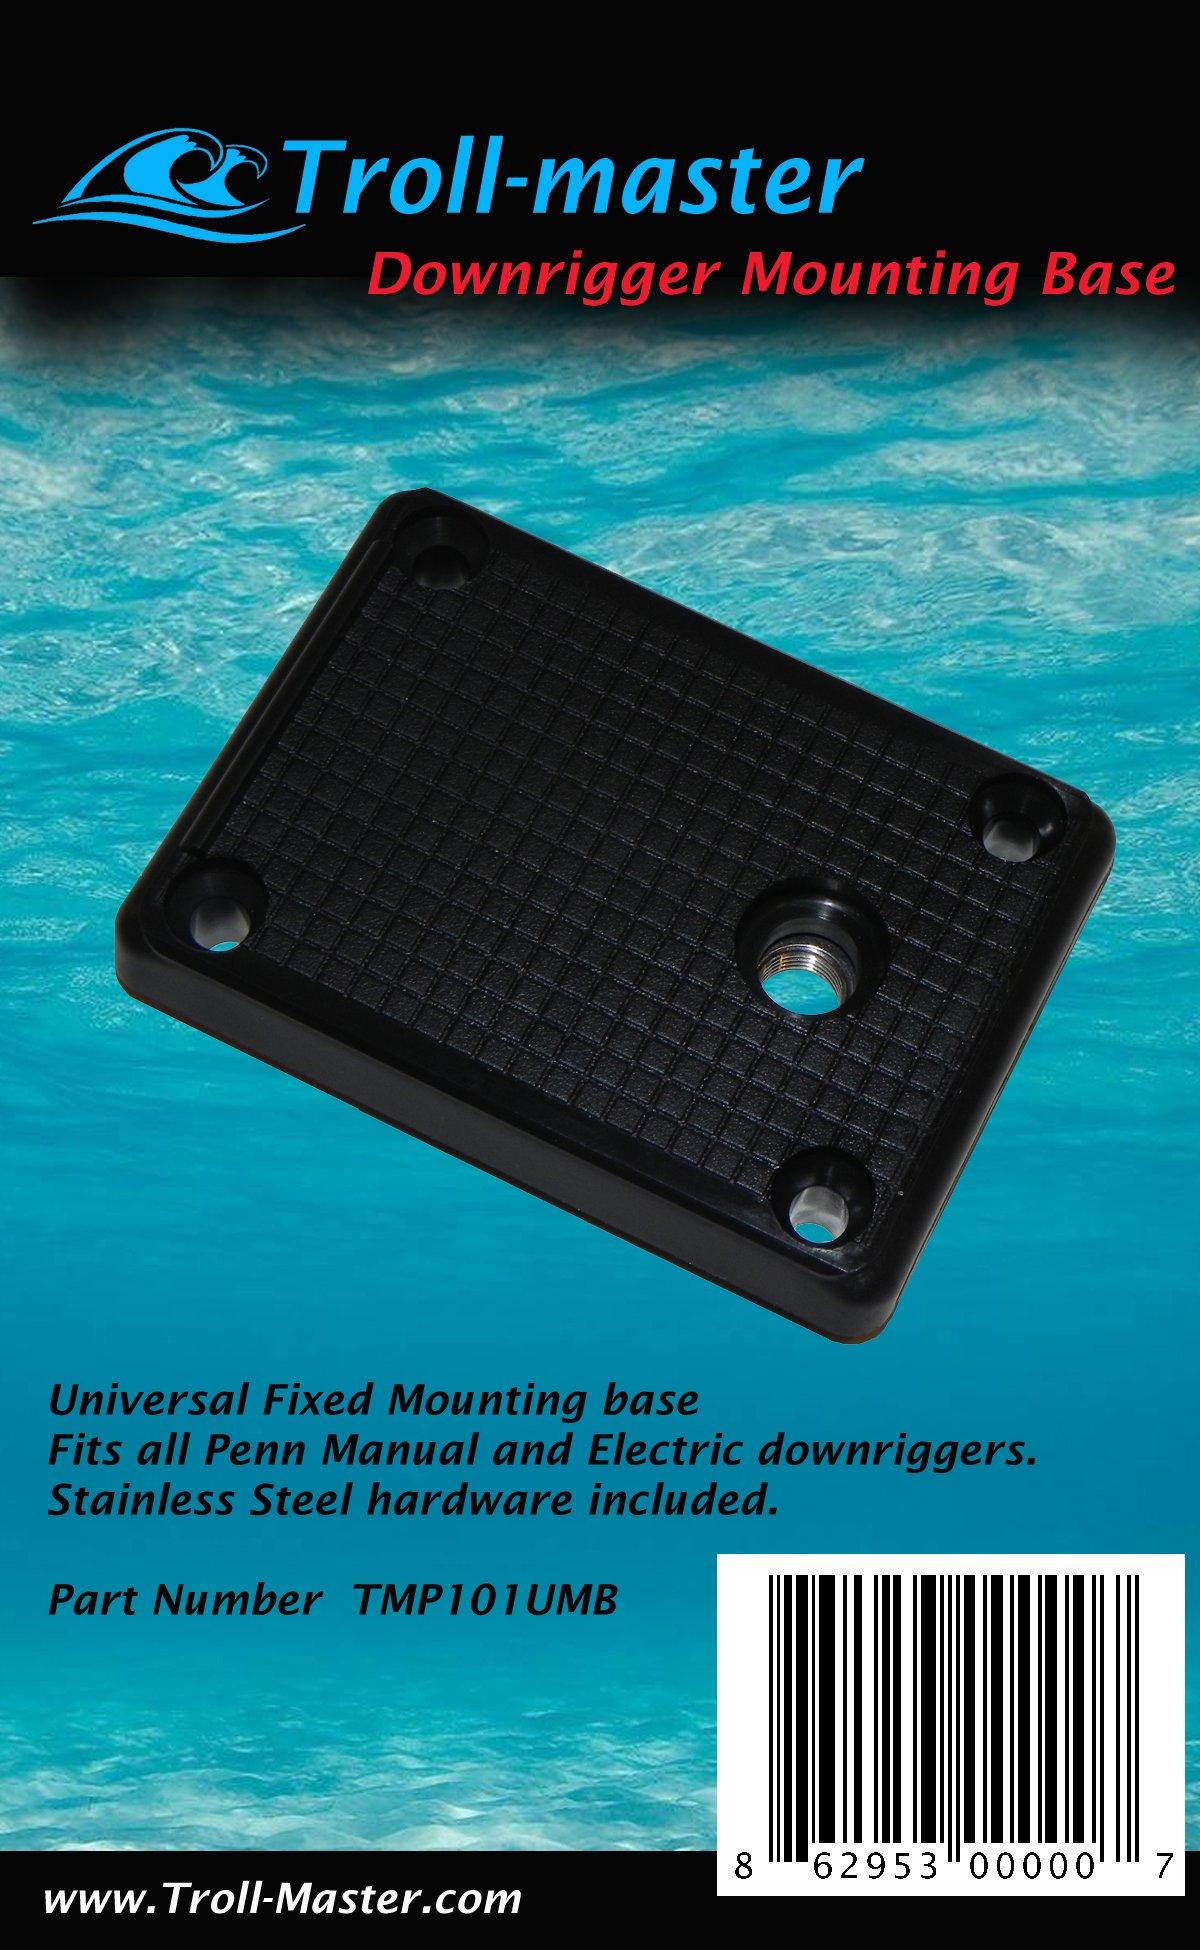 Seahorse Downrigger Mounting Base Plate Fits Penn Fathom-master